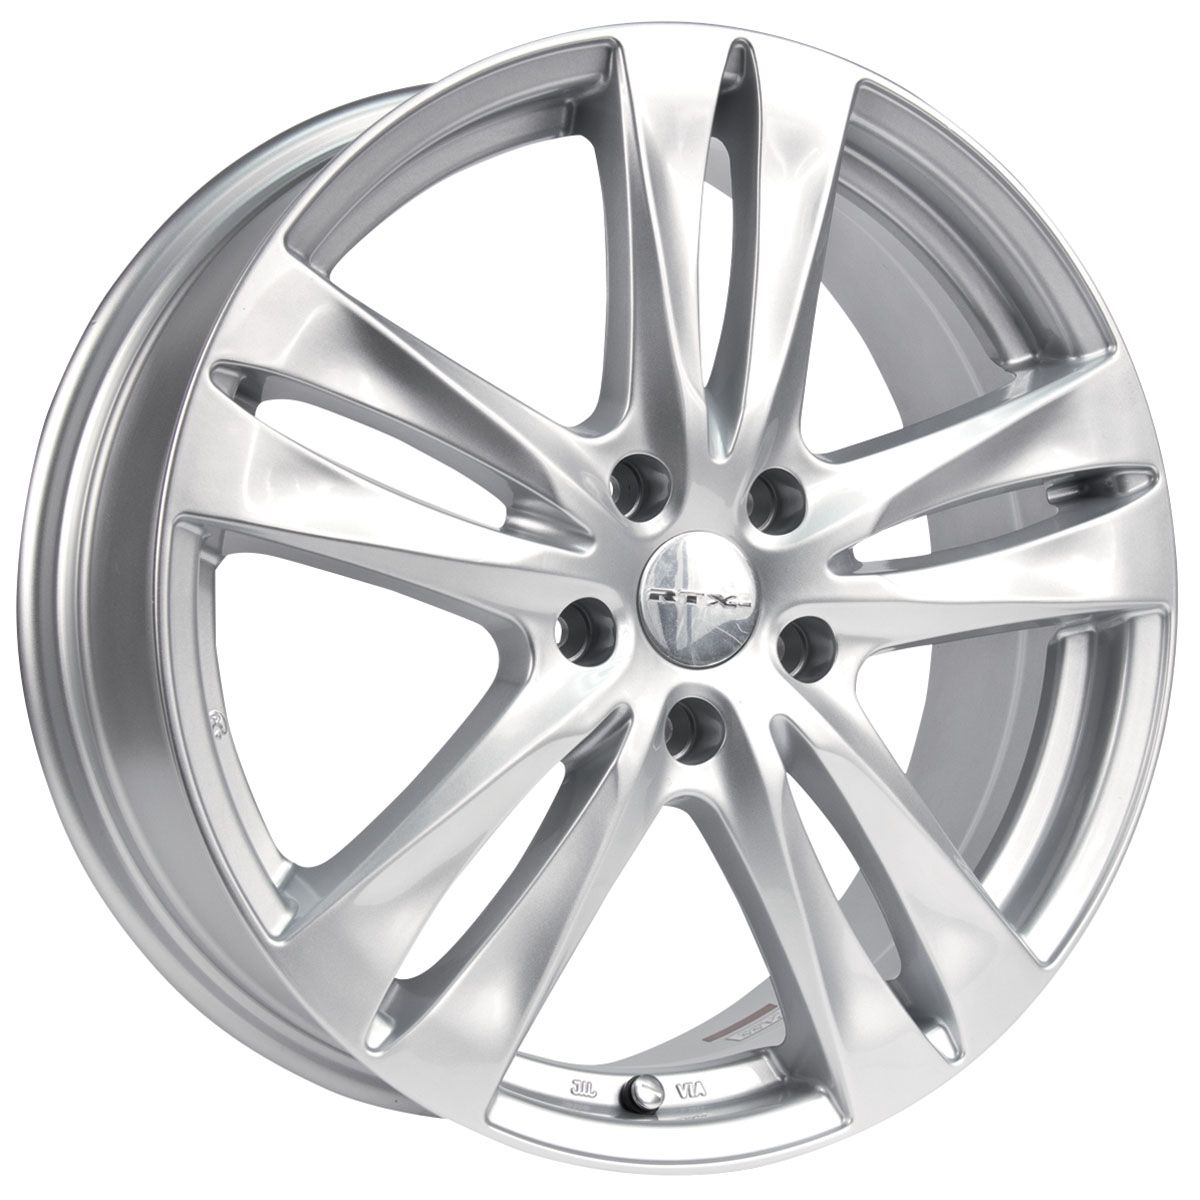 RTX Wheels - RTX OE - Osan Grandeur/Size : 16X6.5 / 17X7 / 18X6.5 http://www.rtxwheels.com/en/wheels/rtxwheels-osan-silver